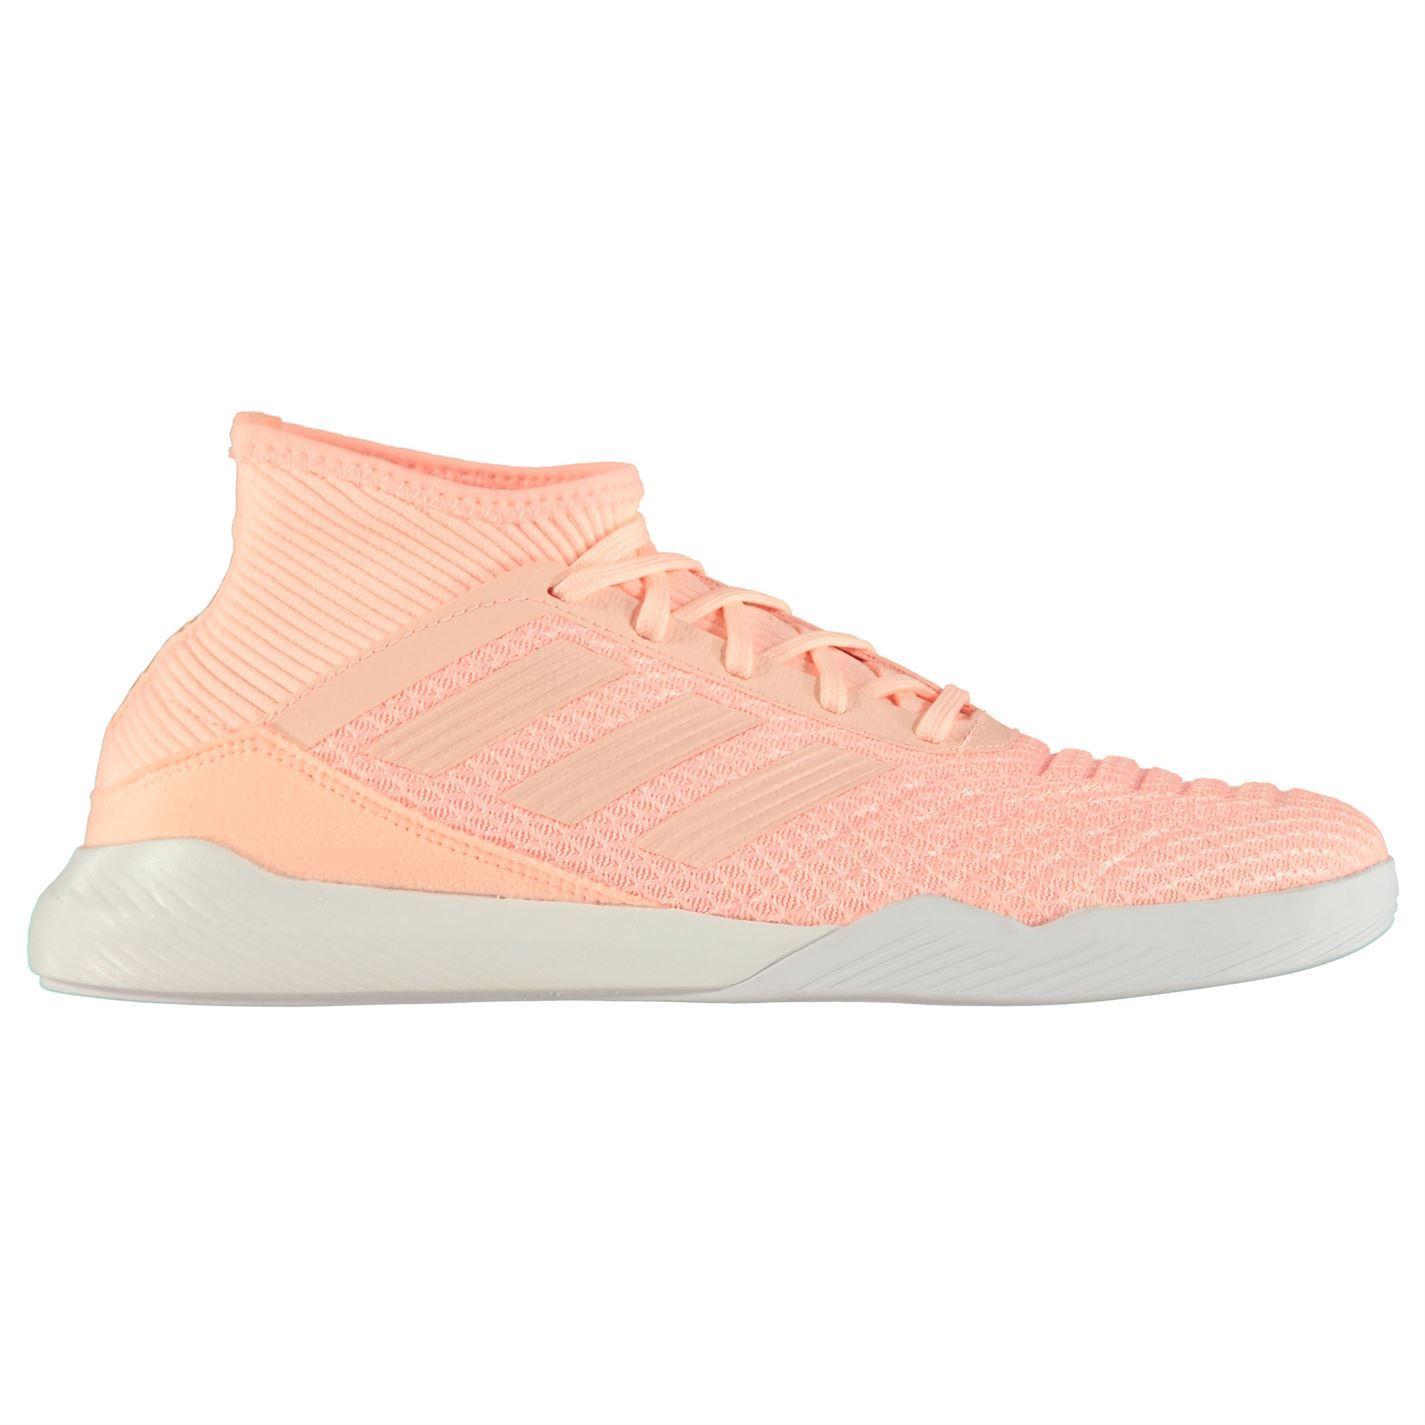 095dab7cc ... adidas Predator Tango 18.3 Indoor Football Trainers Mens Futsal Soccer  Shoes ...